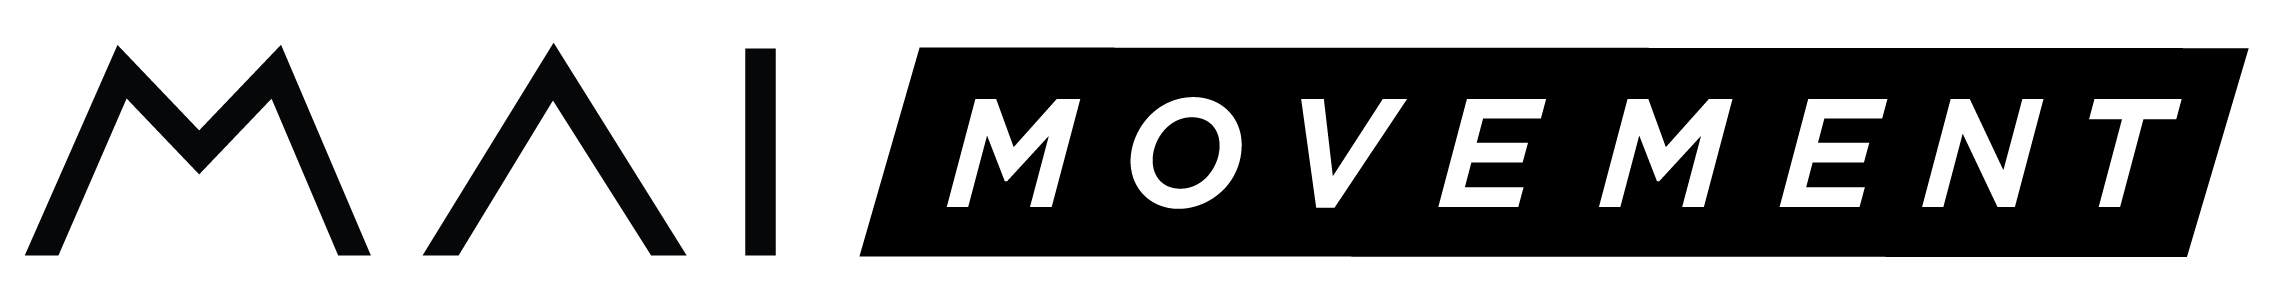 MAI.Web_Nav.Logo_.png